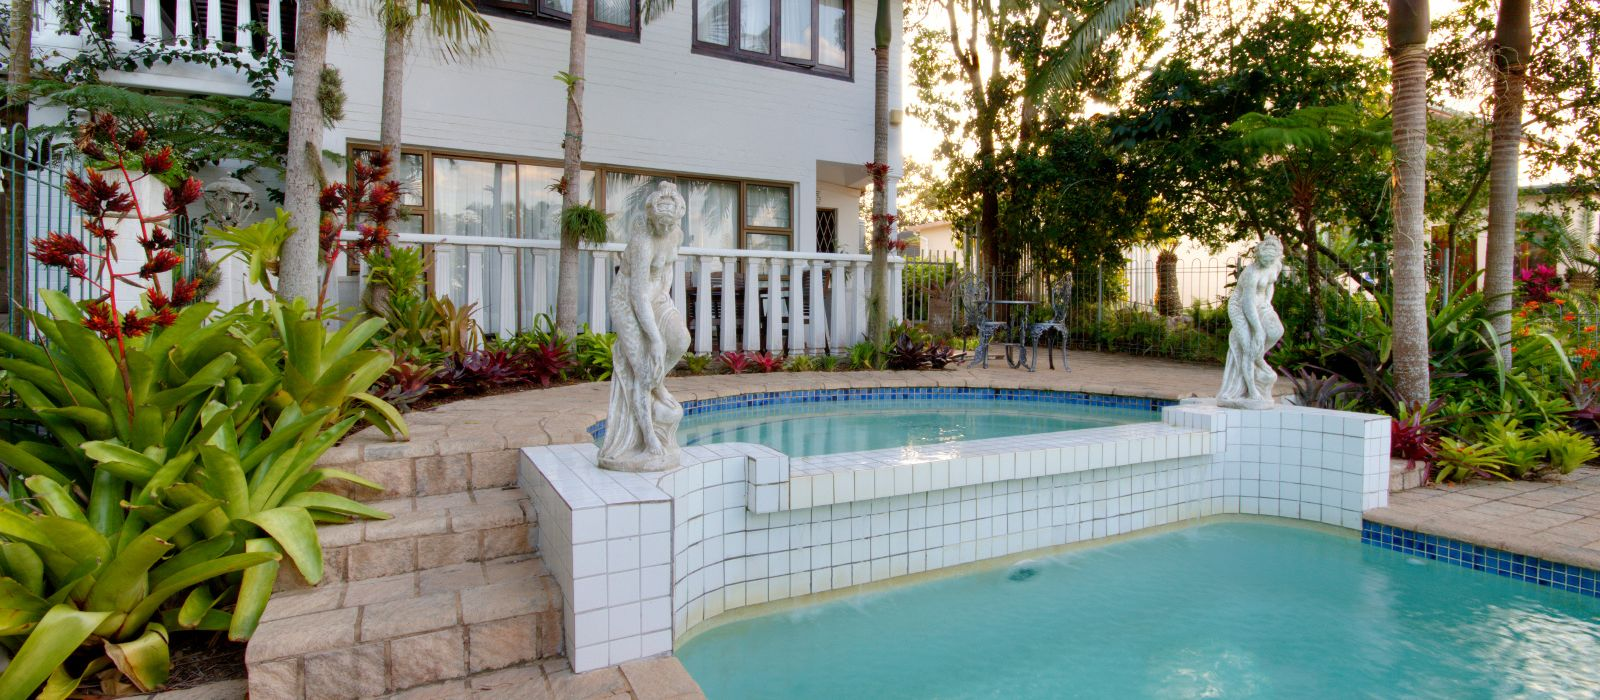 Hotel St. Lucia Wetlands G House Südafrika